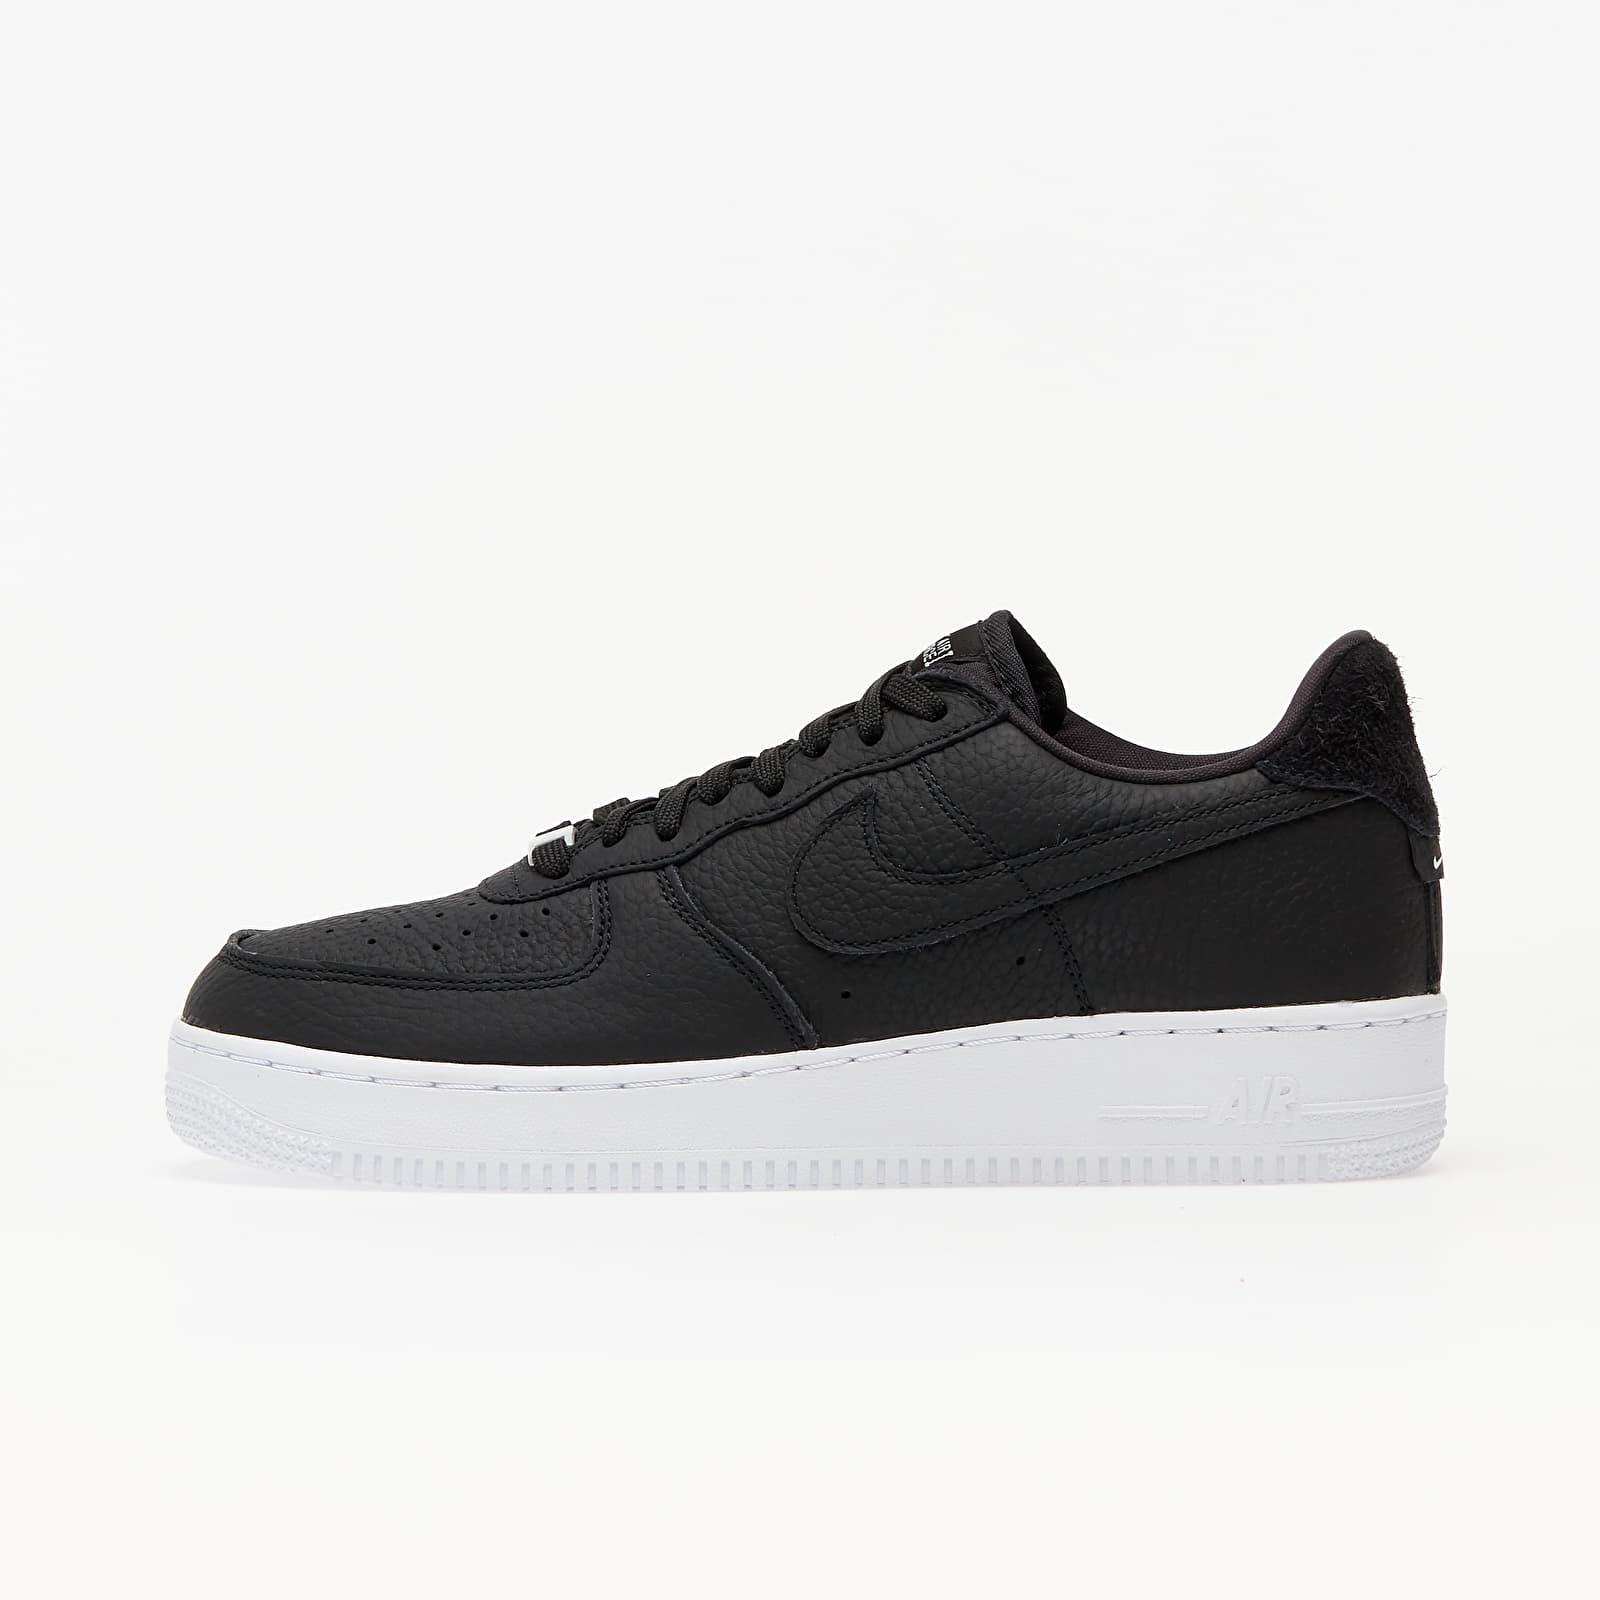 Nike Air Force 1 '07 Craft Black/ Black-White-Vast Grey EUR 42